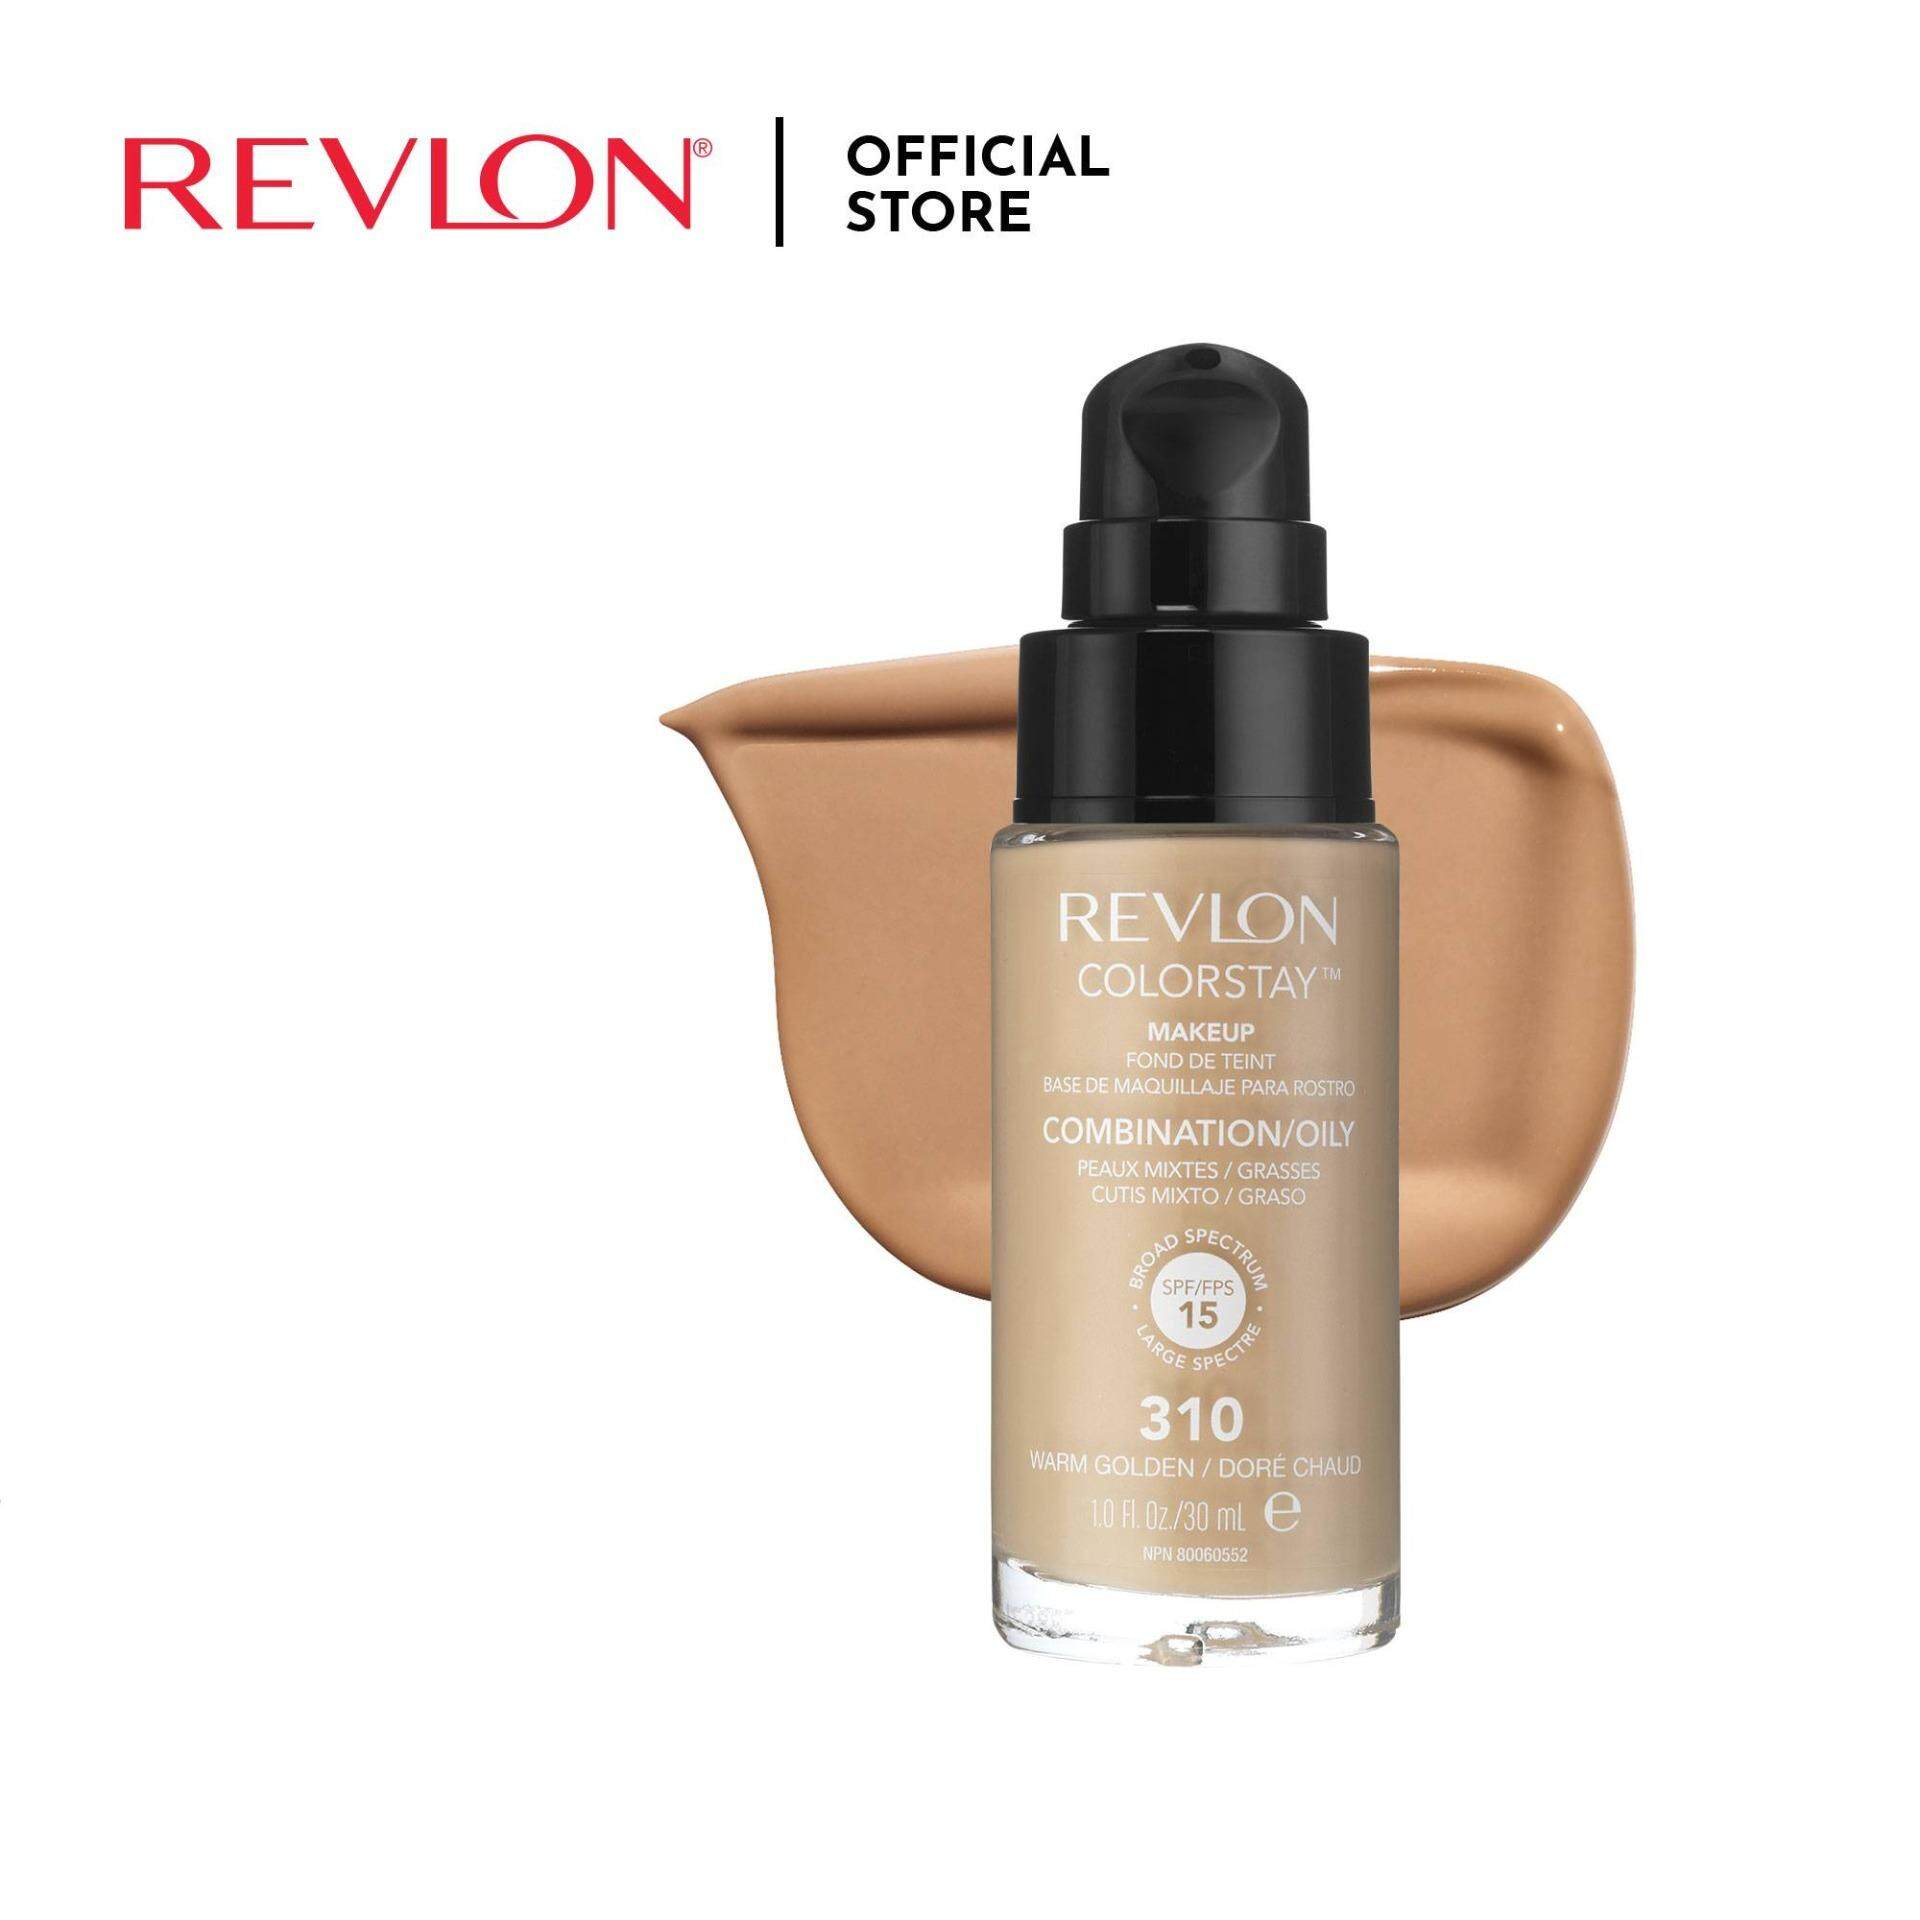 Revlon Colorstay MakeUp Oily / Combination - Warm Golden 310